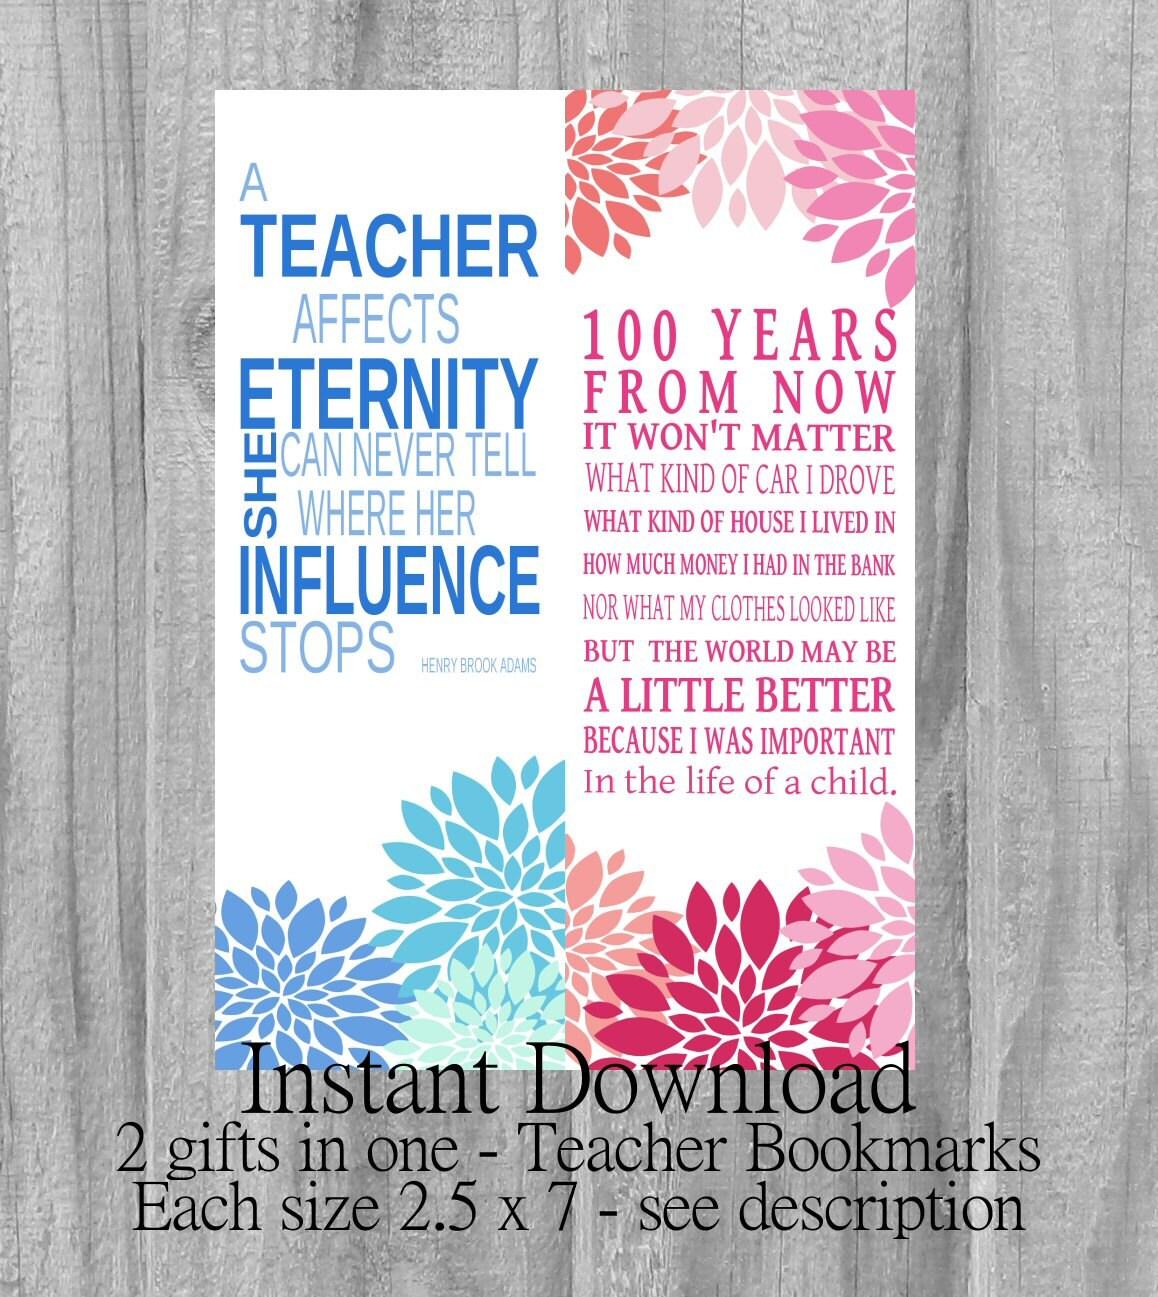 INSTANT DOWNLOAD Printable Teachers Gift Last Minute Gift Poem